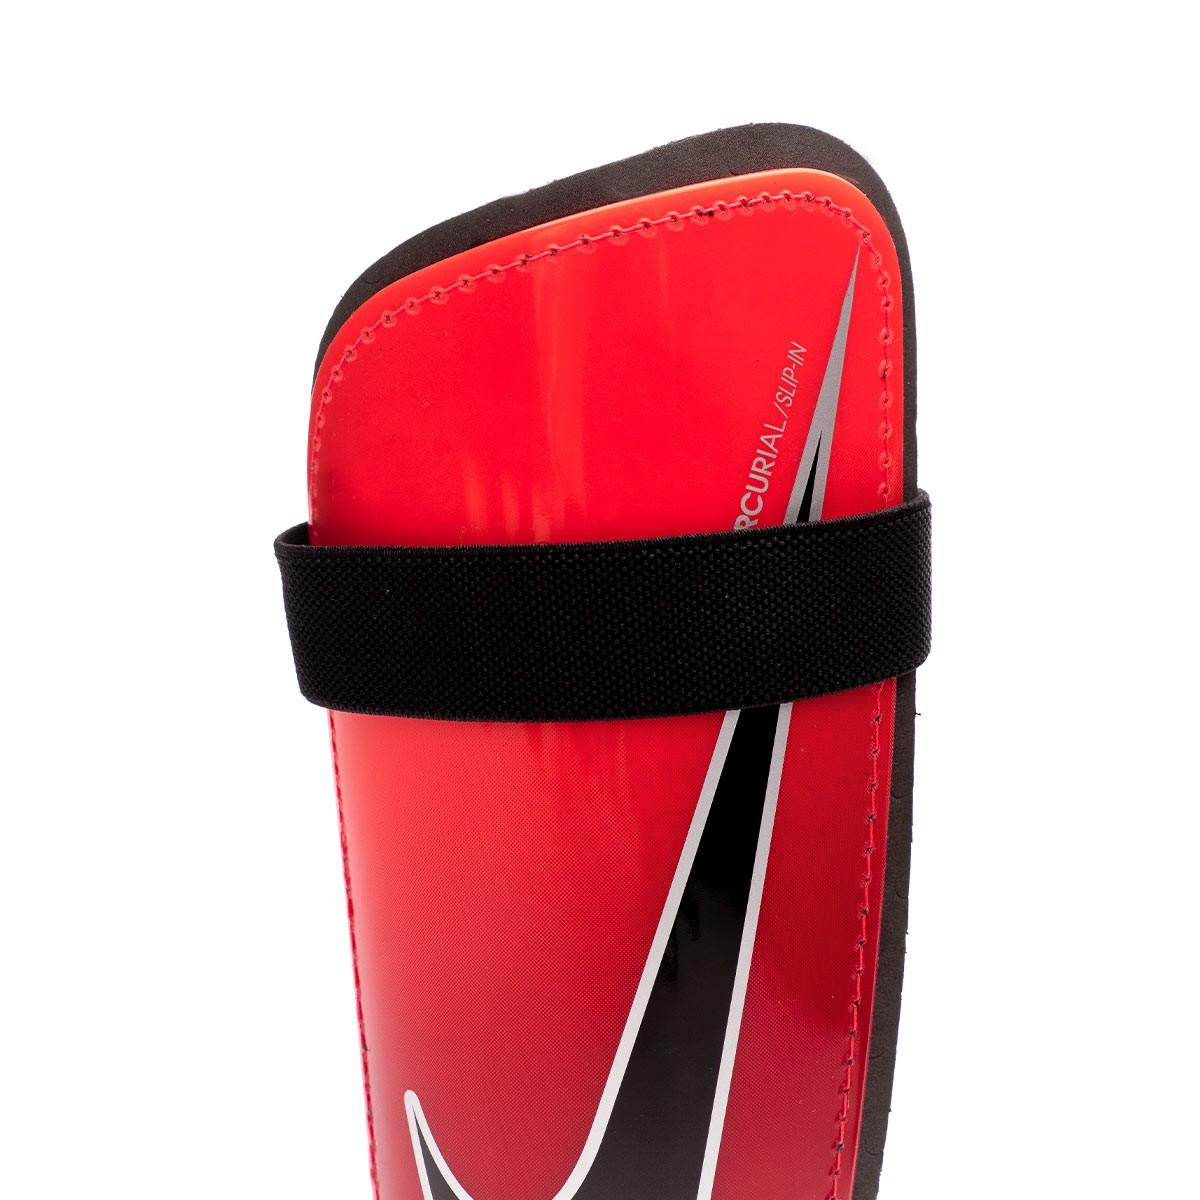 size 40 5cc97 276c6 Shinpads Nike Mercurial Hard Shell In Bright crimson-University red-Black -  Football store Fútbol Emotion